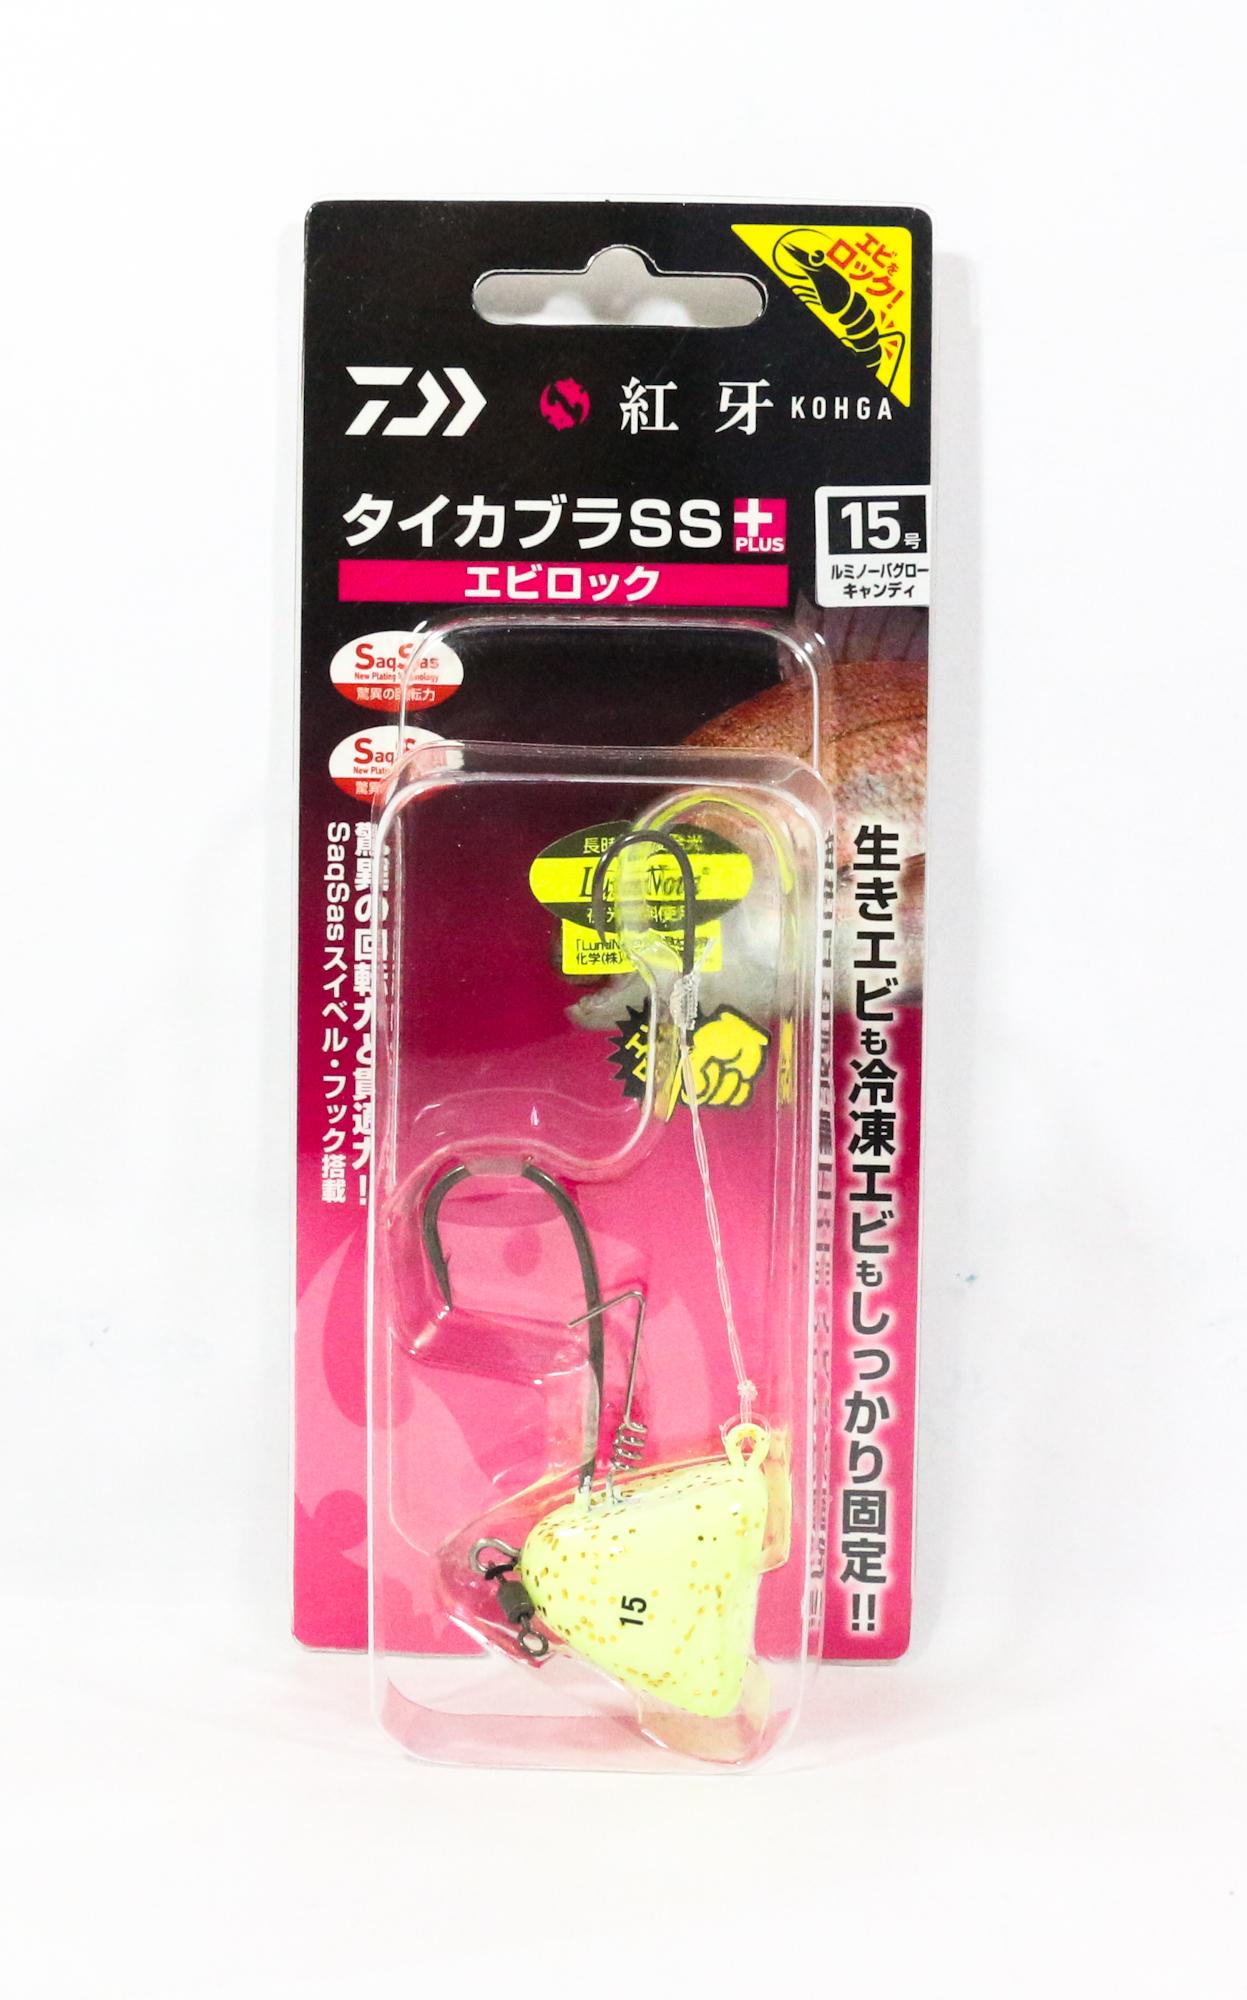 Daiwa Kabura SS+ Tenya Jig Size 15 L Glow/G Flake 003257